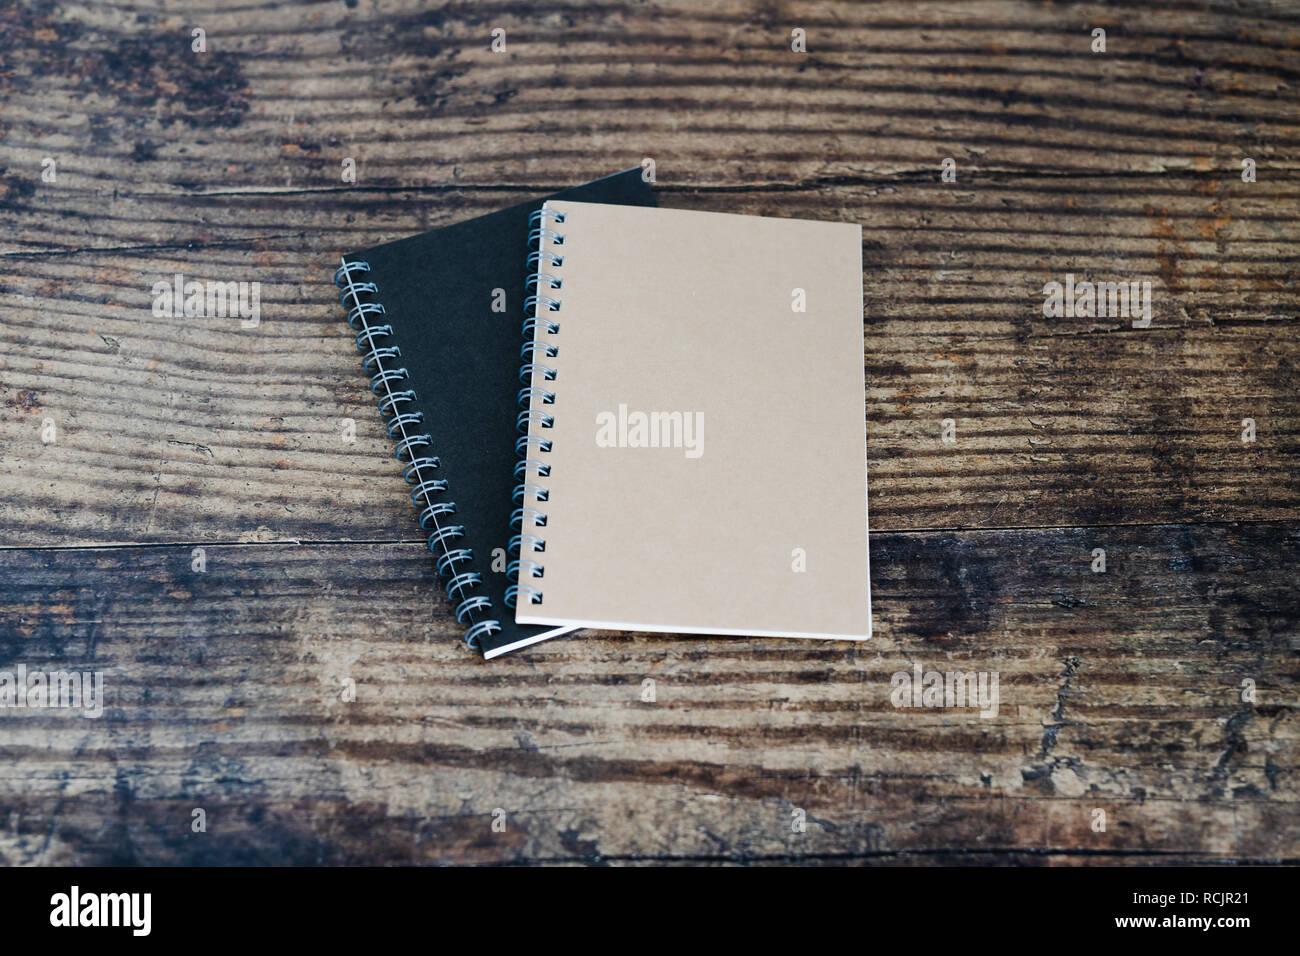 minimalist desk setting flatlay with notepads on dark wooden